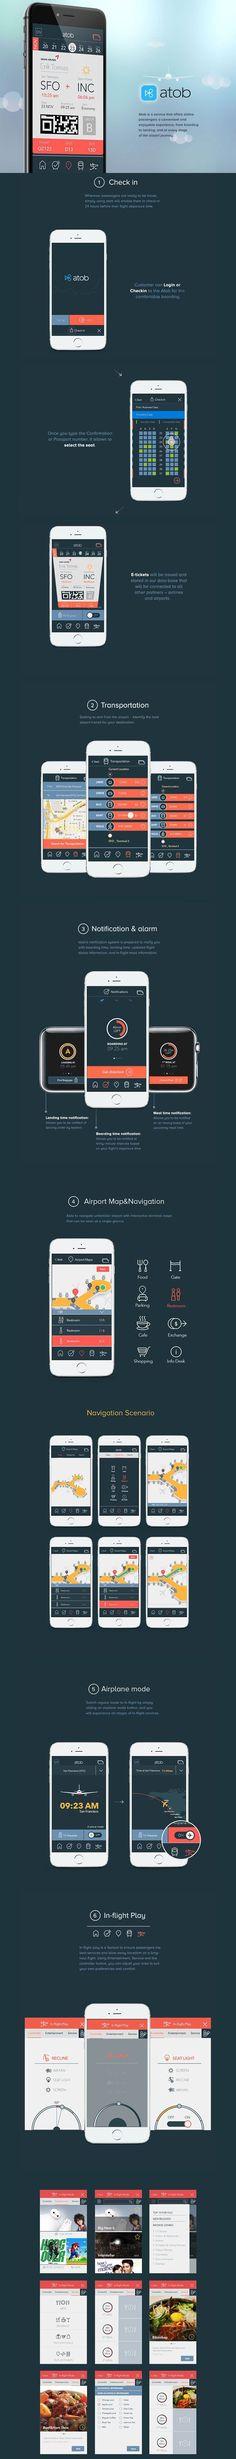 Atob (Airline Service App) plane trip travel booking app ios iphone smartphone